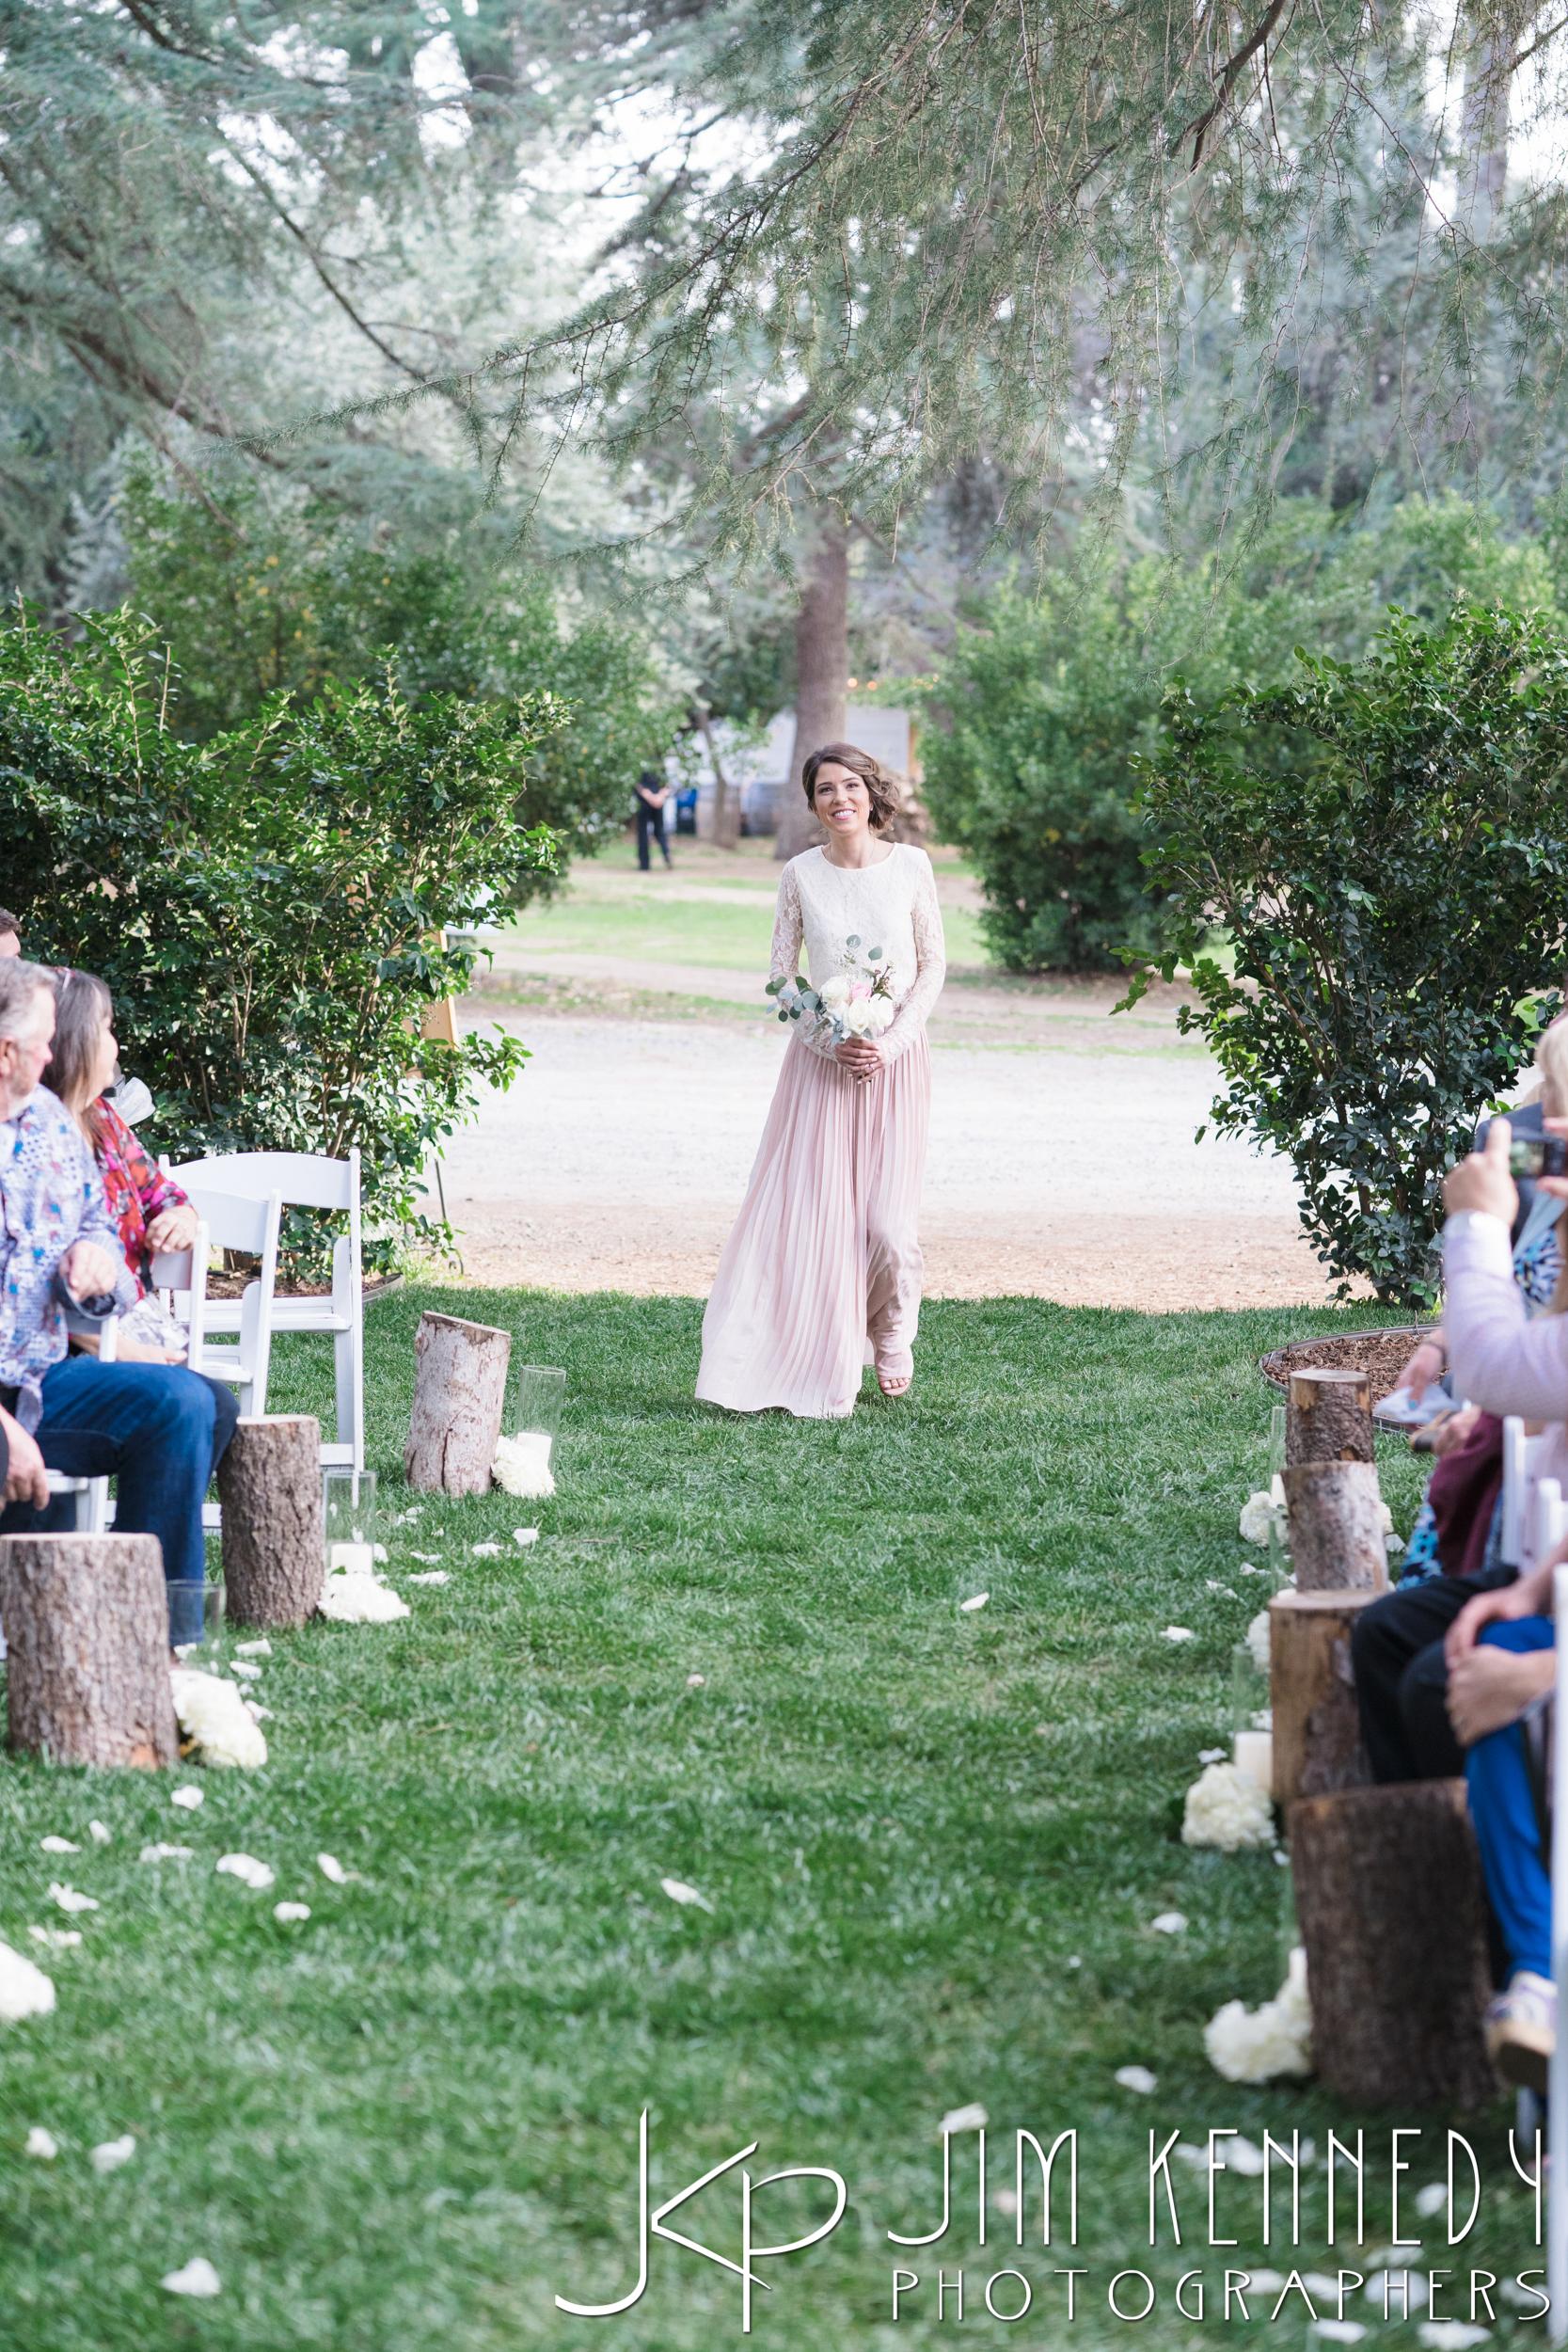 jim_kennedy_photographers_highland_springs_wedding_caitlyn_0099.jpg